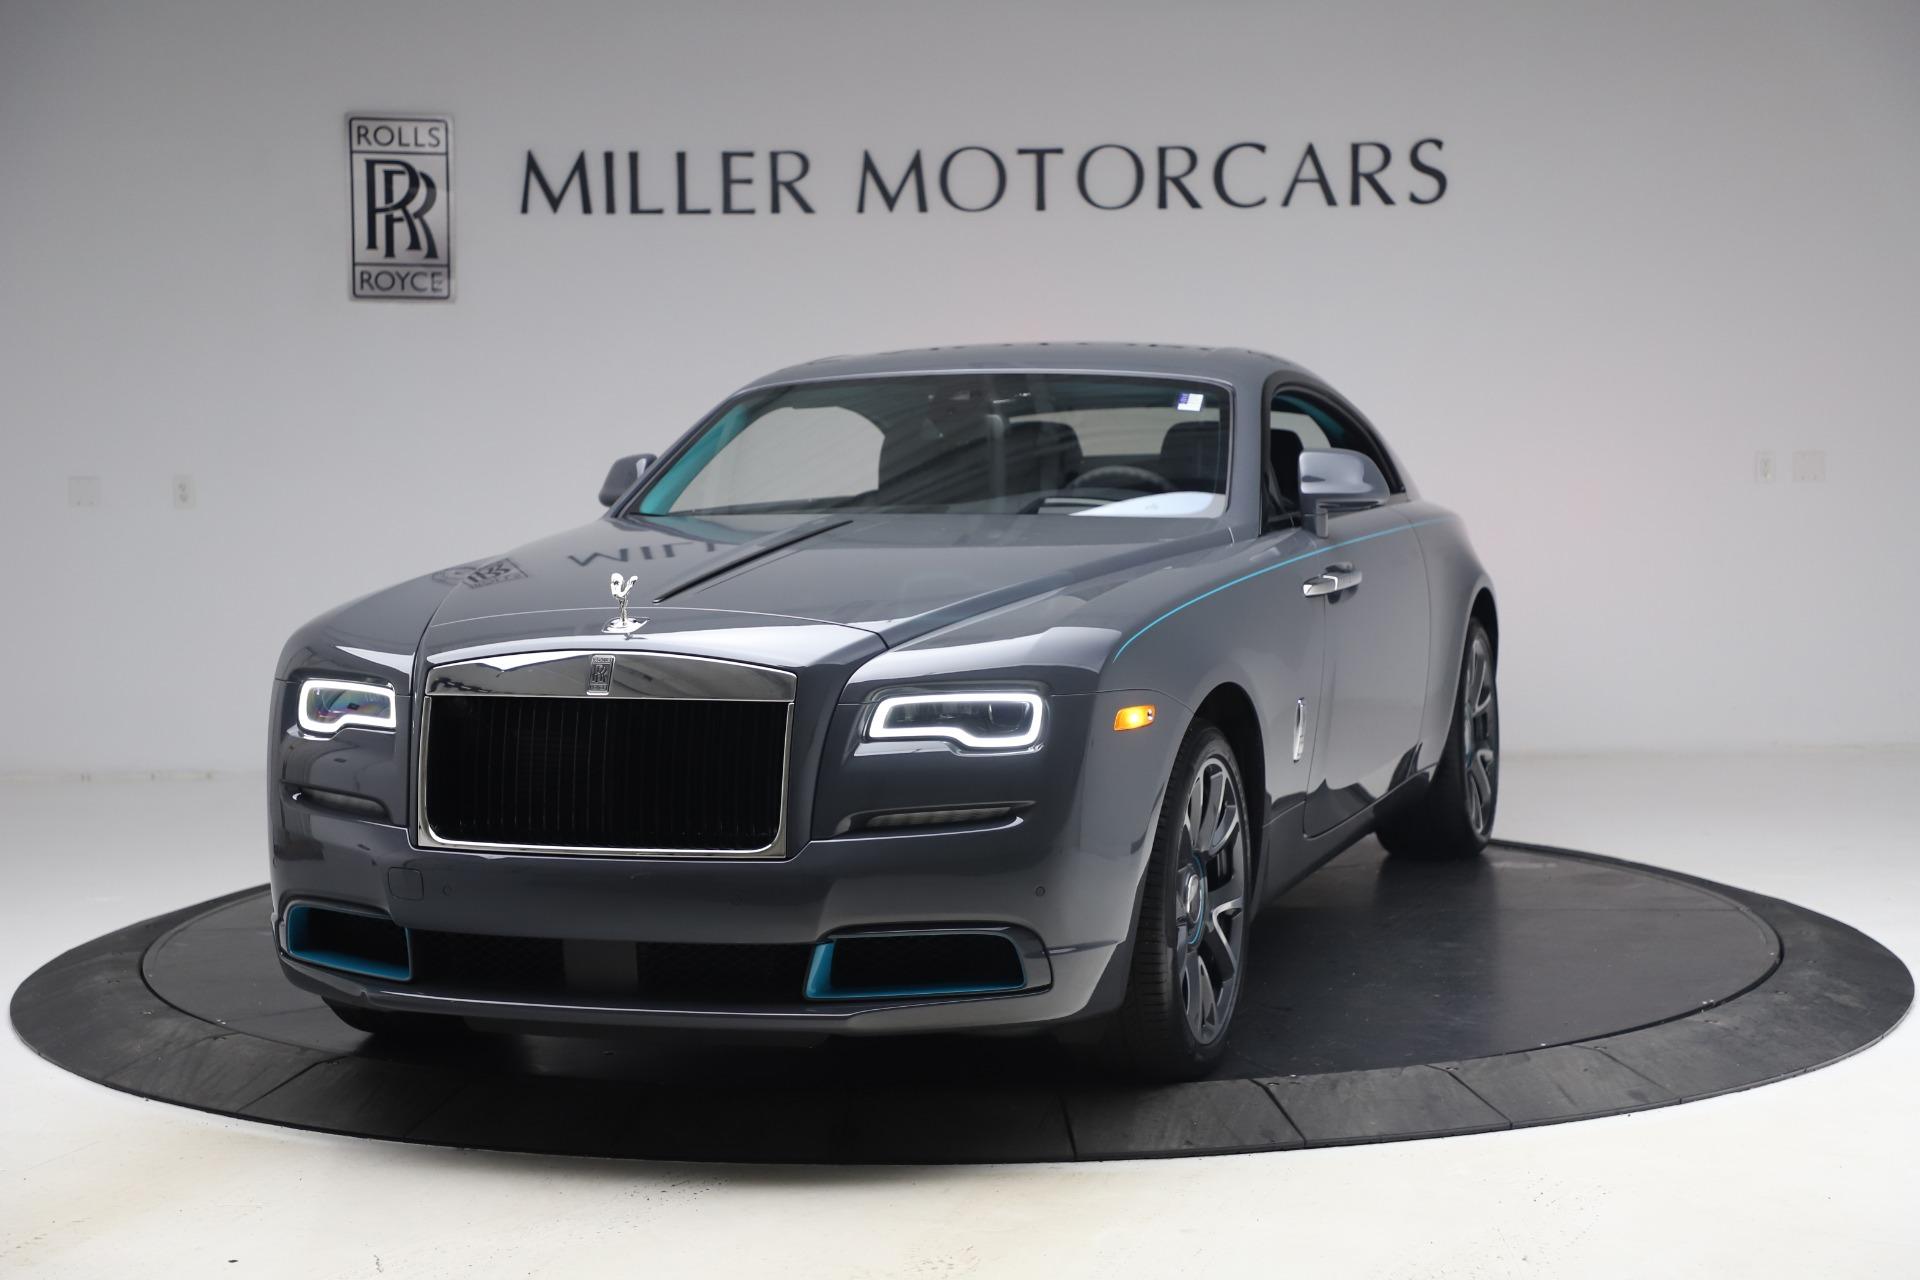 New 2021 Rolls-Royce Wraith KRYPTOS for sale $450,550 at Bugatti of Greenwich in Greenwich CT 06830 1